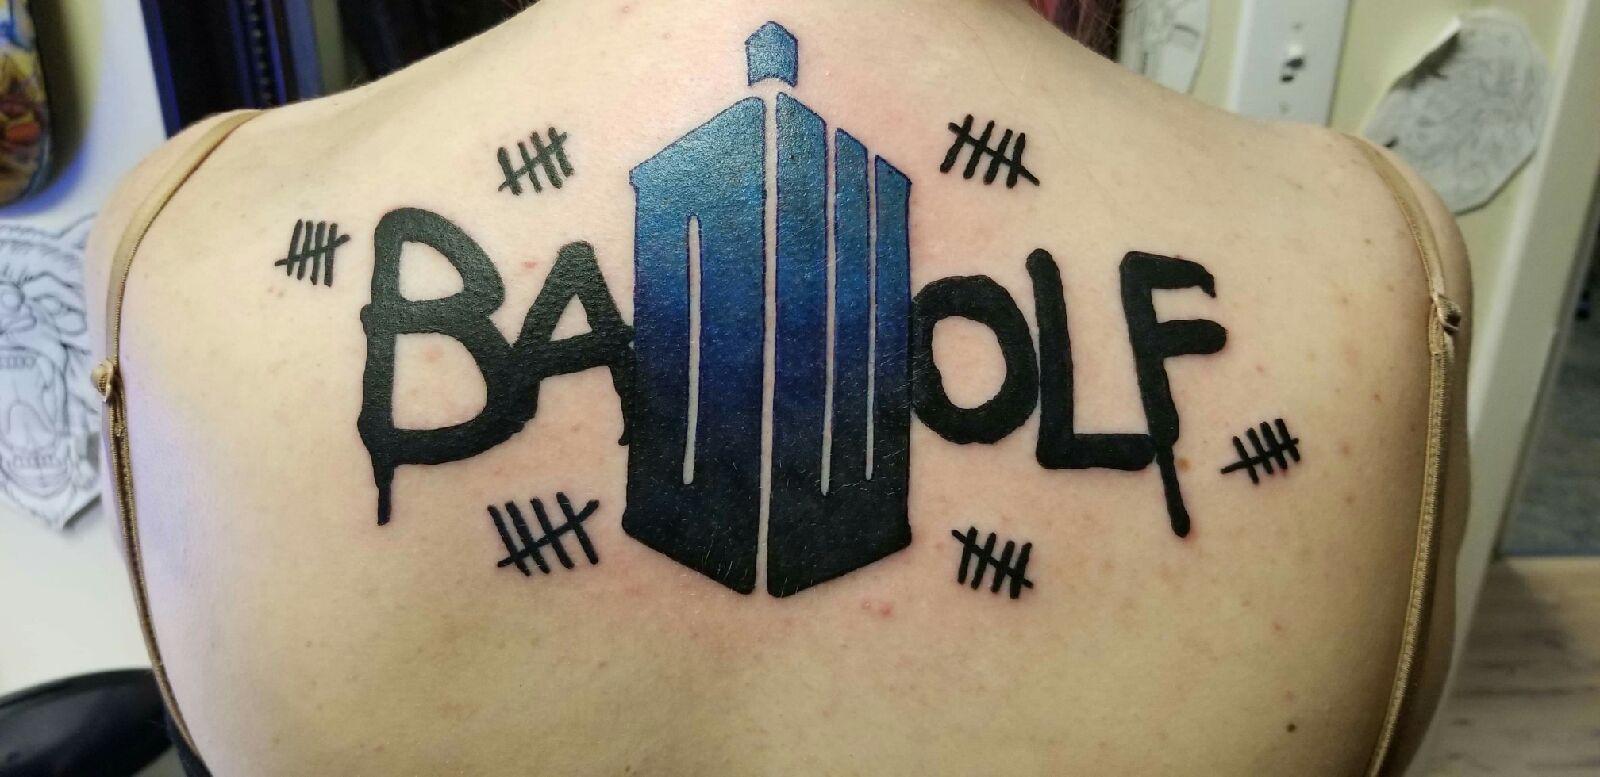 Finally Got My Bad Wolf Tattoohttps Imgur Com M79fvoj Bad Wolf Tattoo Doctor Who Tattoos Tattoos